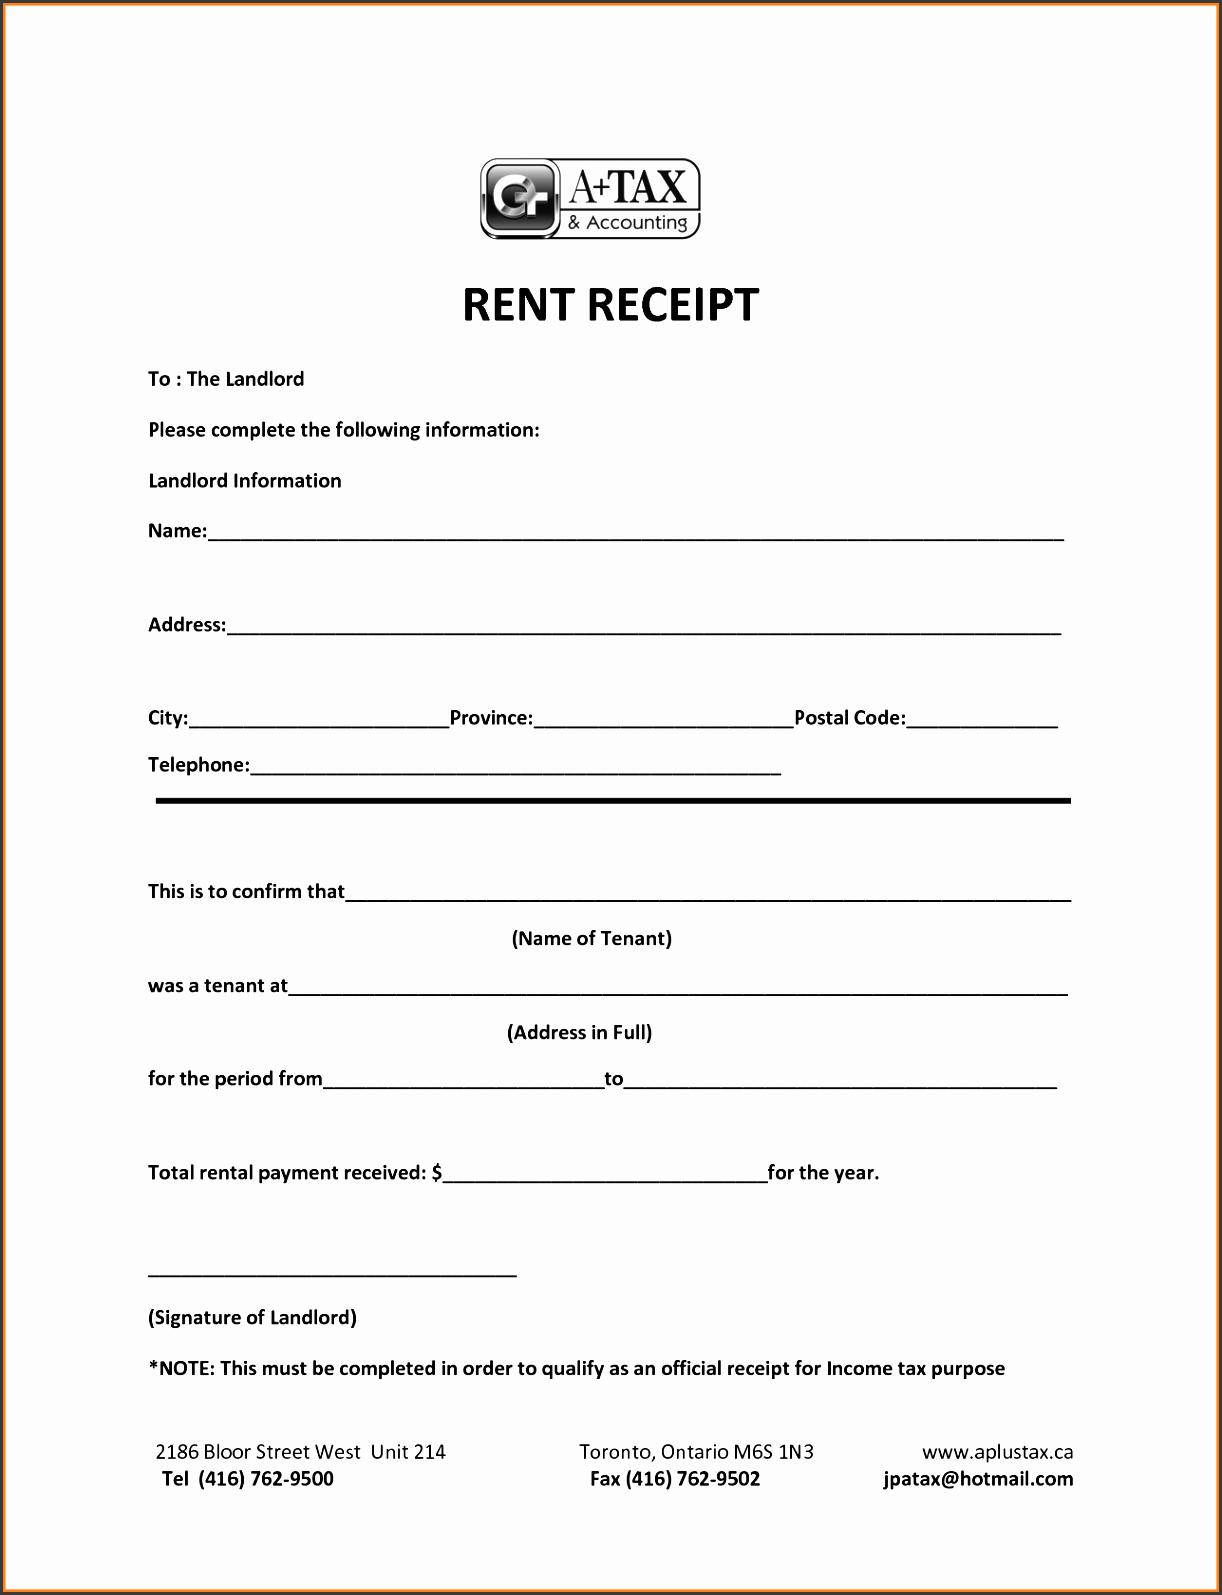 Payment Received Receipt Pl Forms Christmas Wish List Paper Payment Receipt  Format Gansa Unique Official Receipt  Christmas List Format